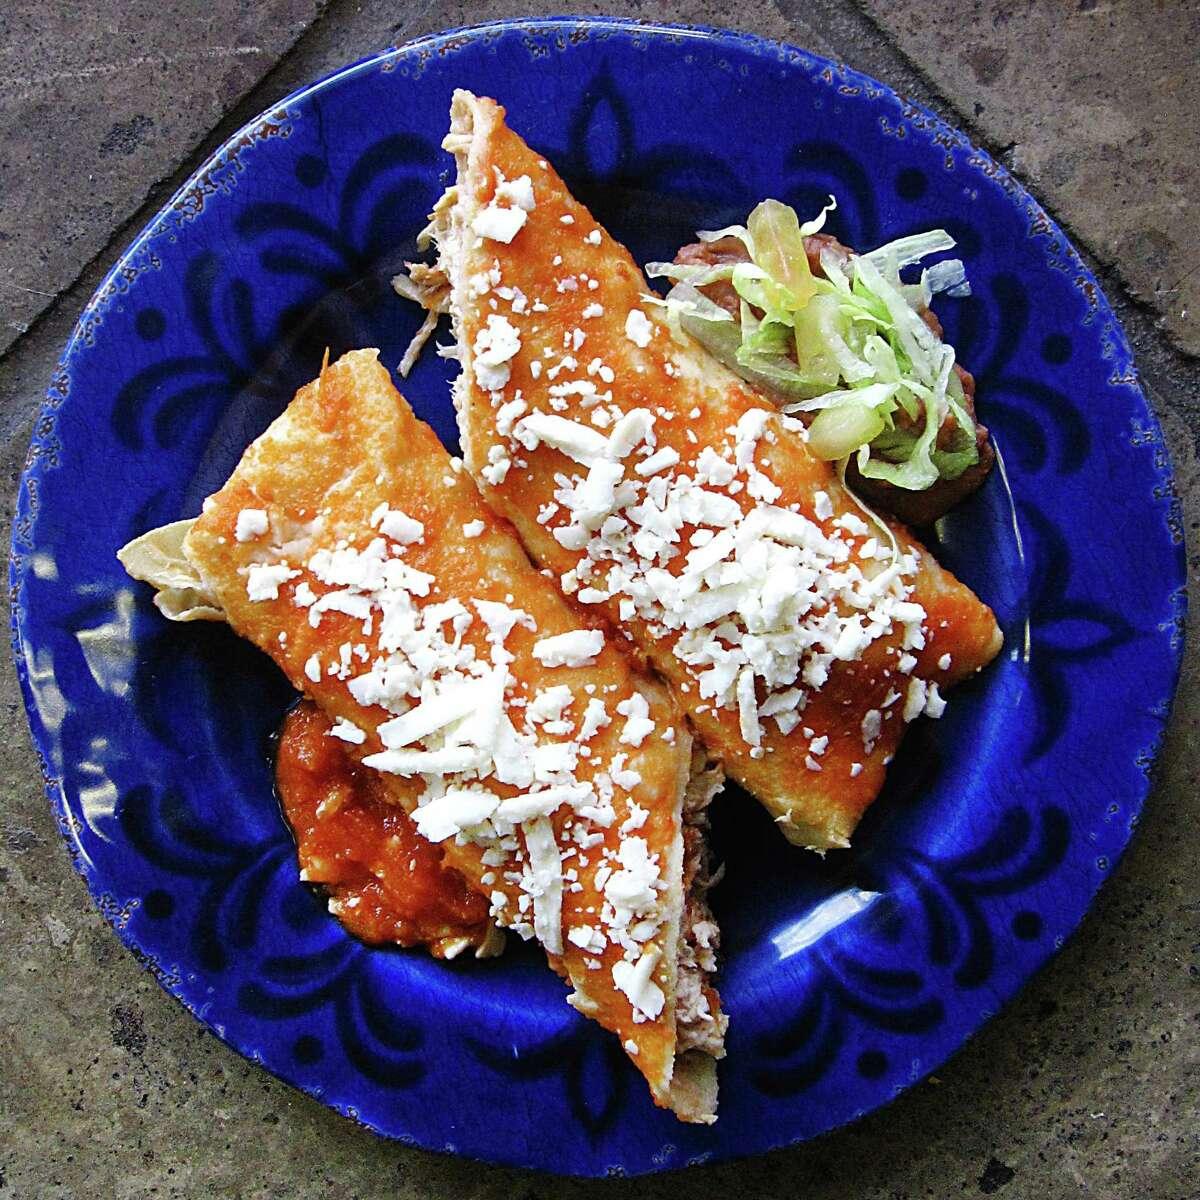 A rolled taco entomatado with chicken in a handmade tortilla from La Siberia Taquería.